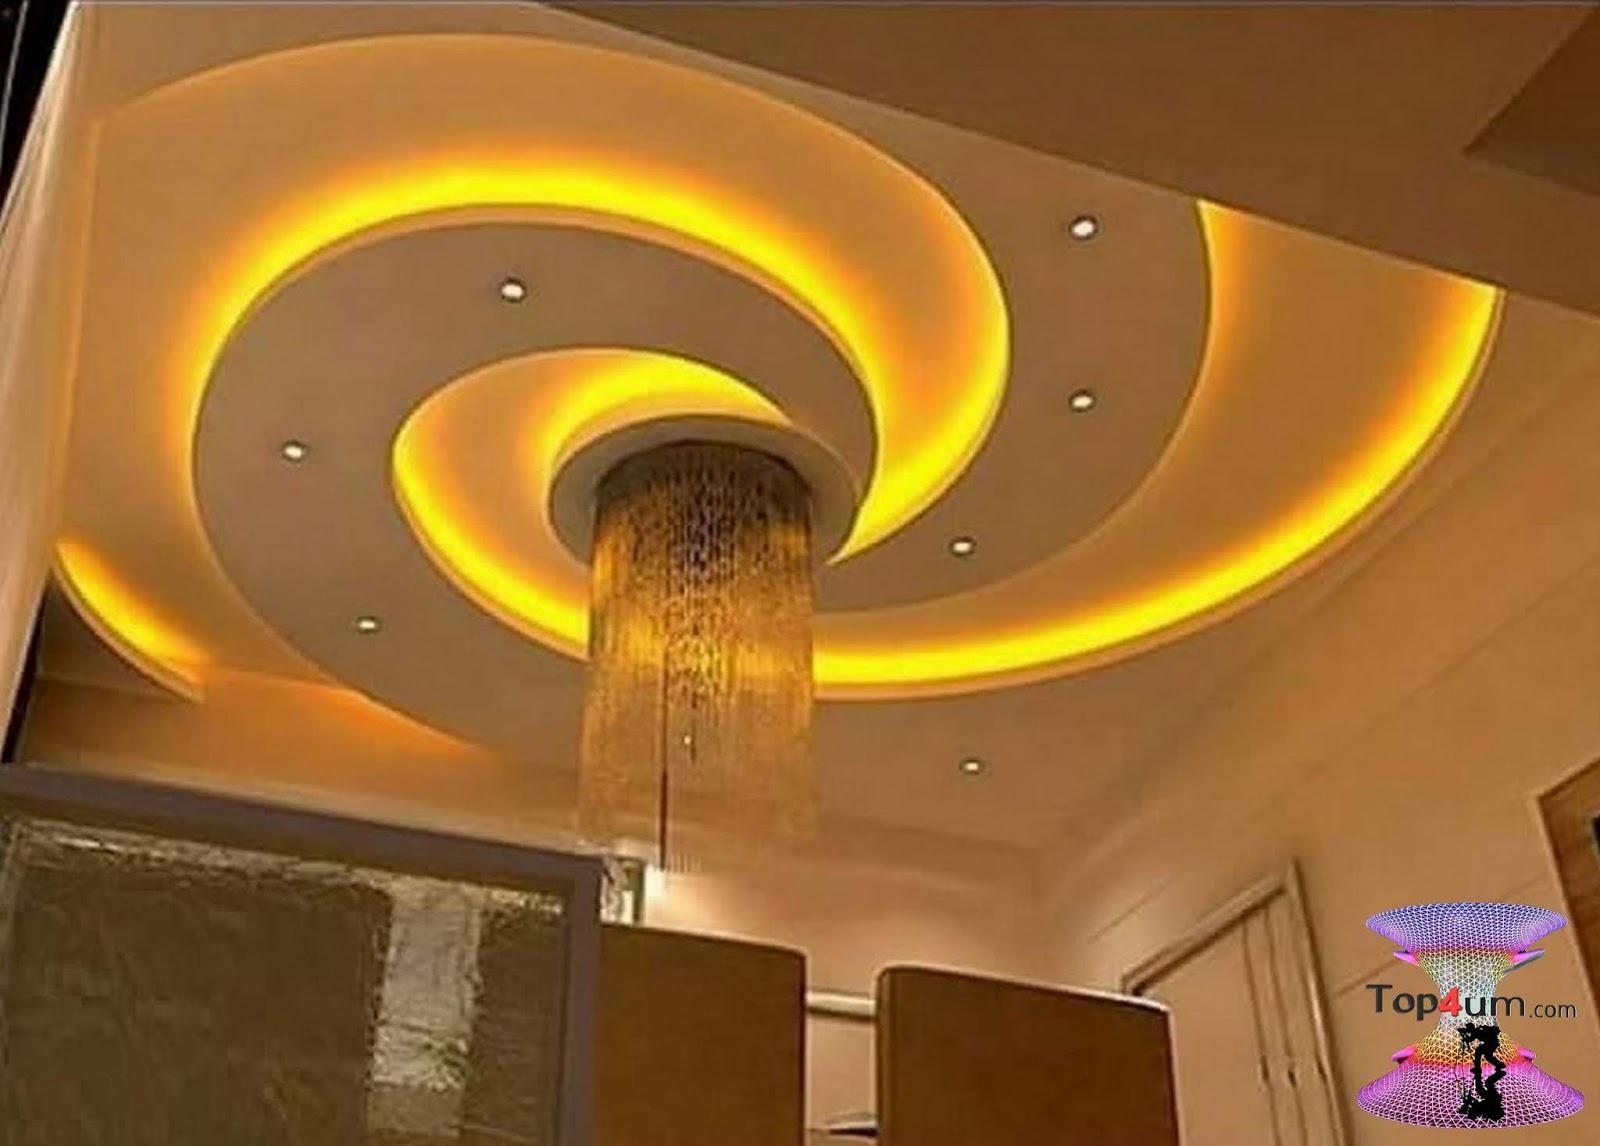 افضل ديكورات جبس اسقف راقيه 2019 Modern Gypsum Board For Walls And Ceilings Pop False Ceiling Design Gypsum Ceiling Design Pop Ceiling Design